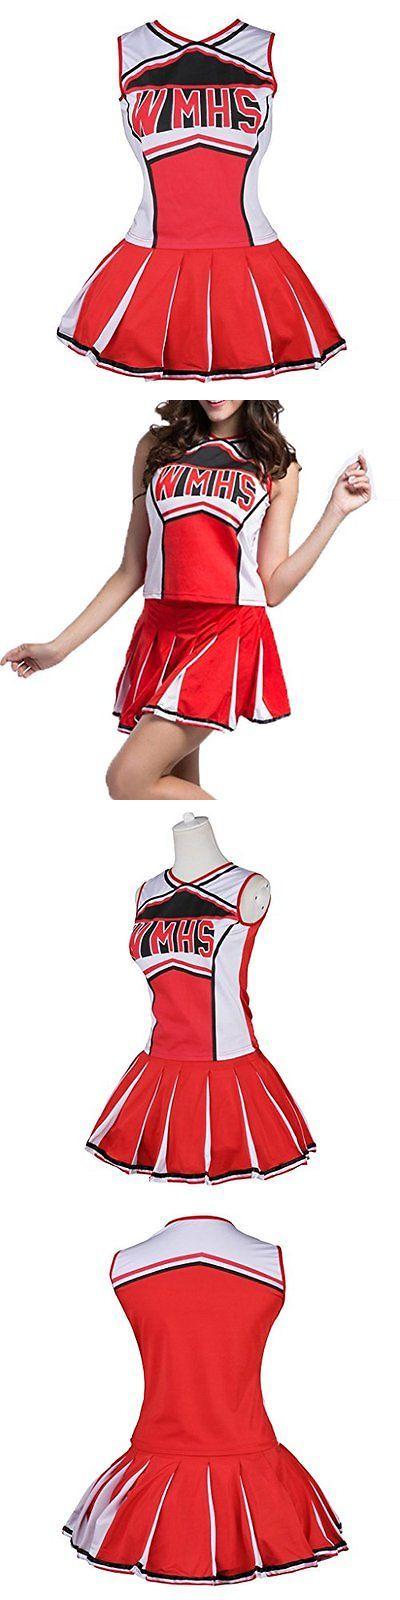 Halloween Costumes: Womens Cheerleader Costume Uniform Fancy Dress Red, Us 14-16 Xl BUY IT NOW ONLY: $30.74